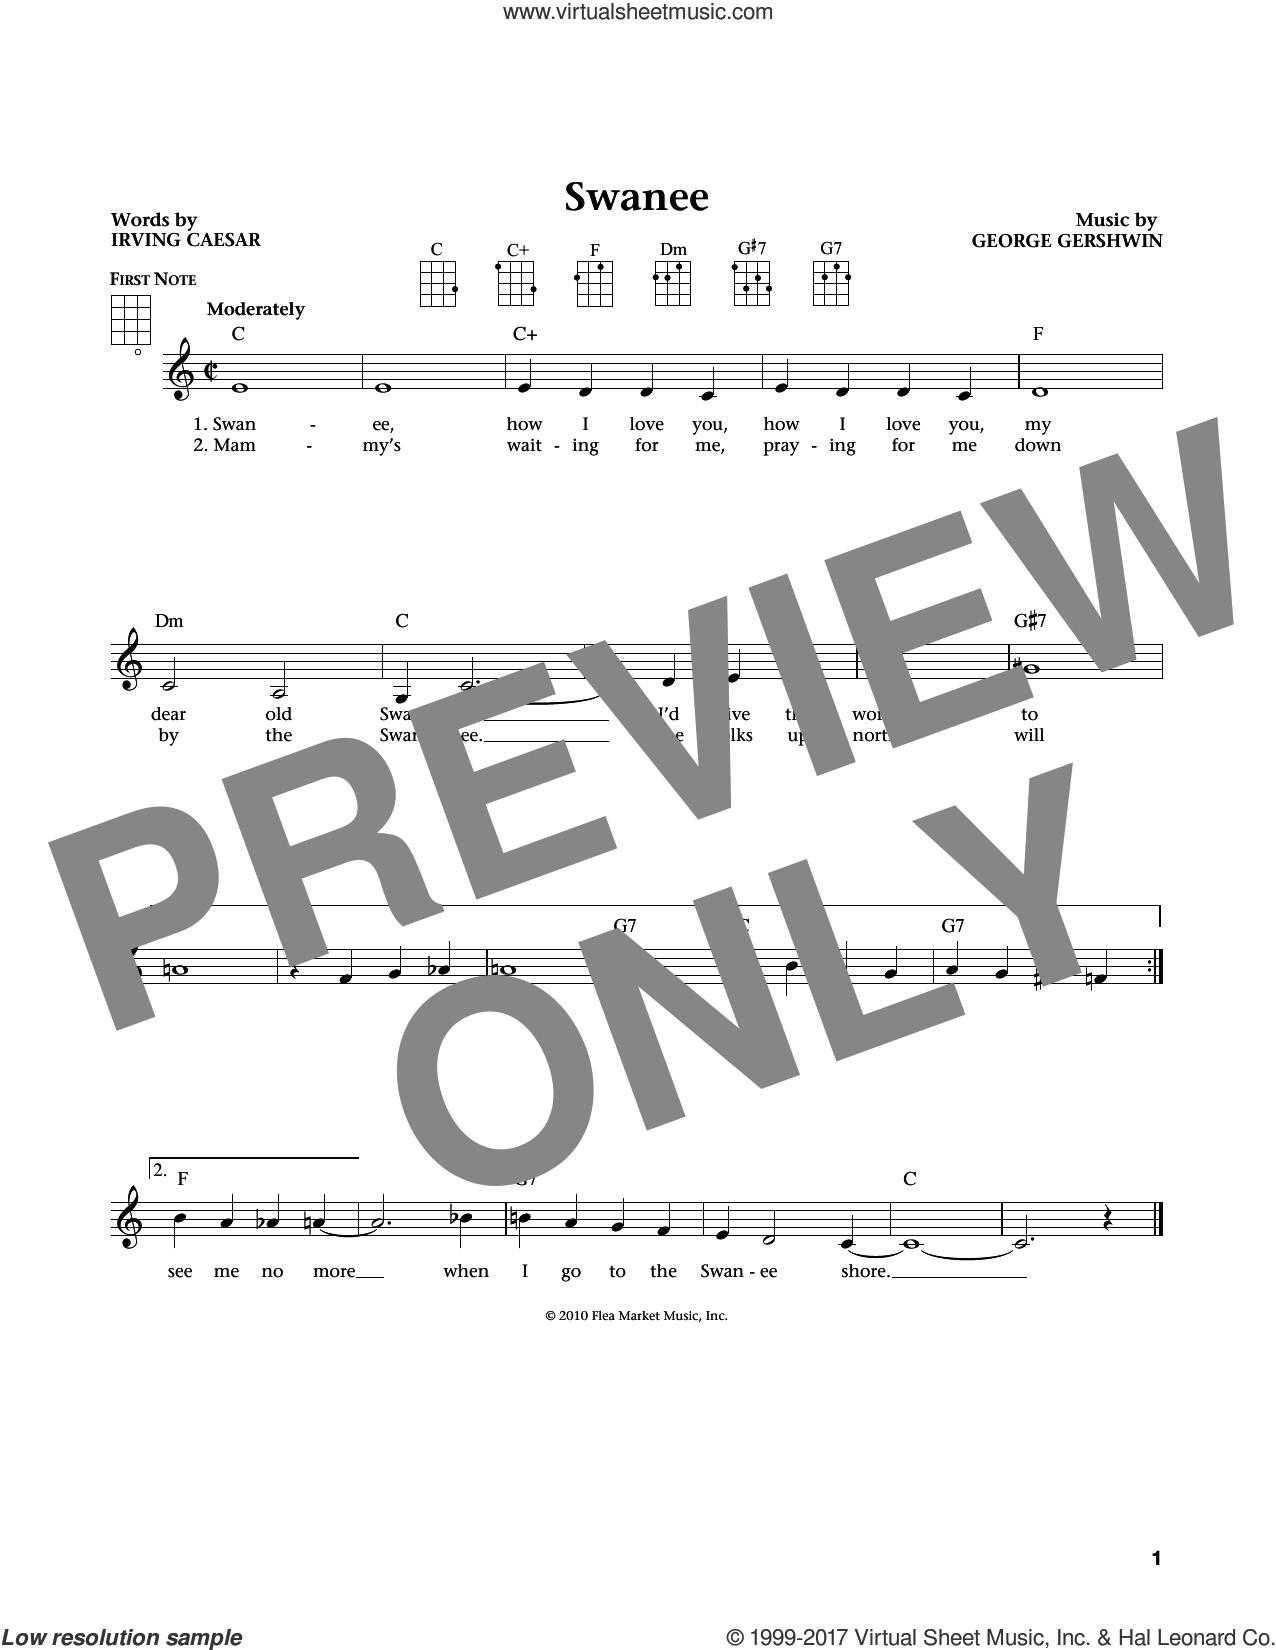 Swanee (from The Daily Ukulele) (arr. Liz and Jim Beloff) sheet music for ukulele by George Gershwin, Jim Beloff, Liz Beloff and Irving Caesar, intermediate skill level